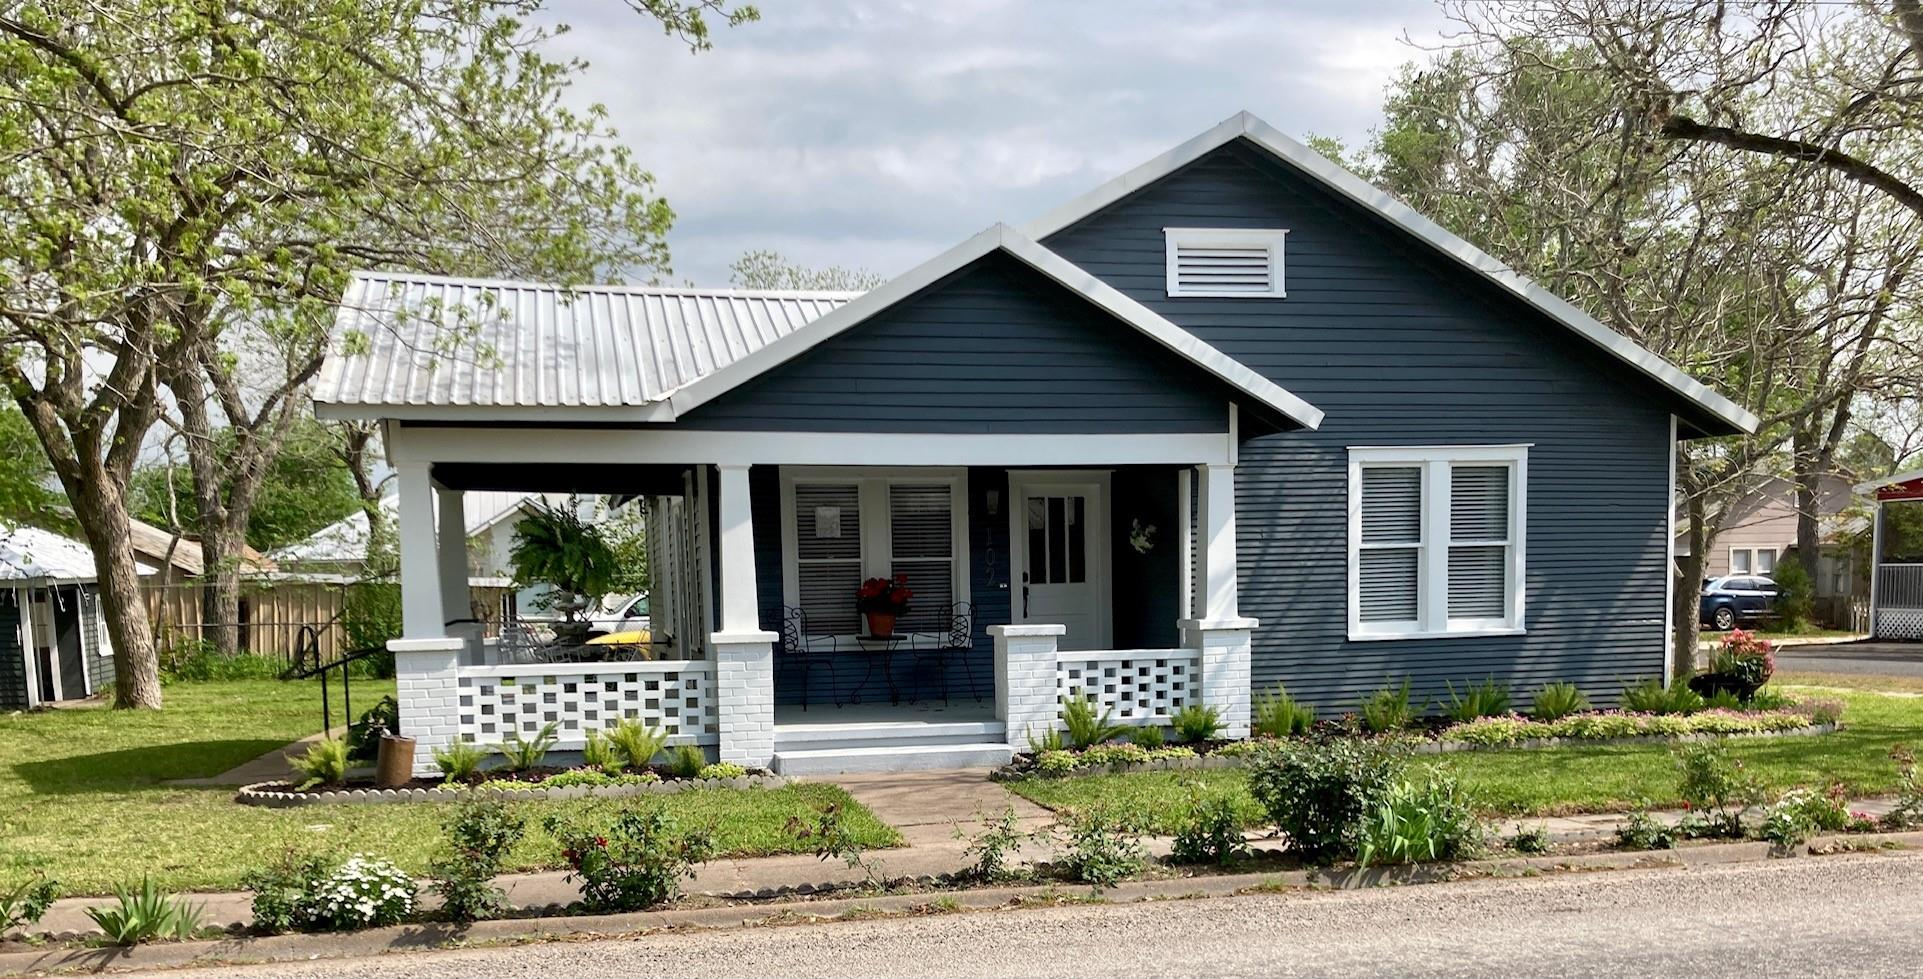 102 E Main Property Photo